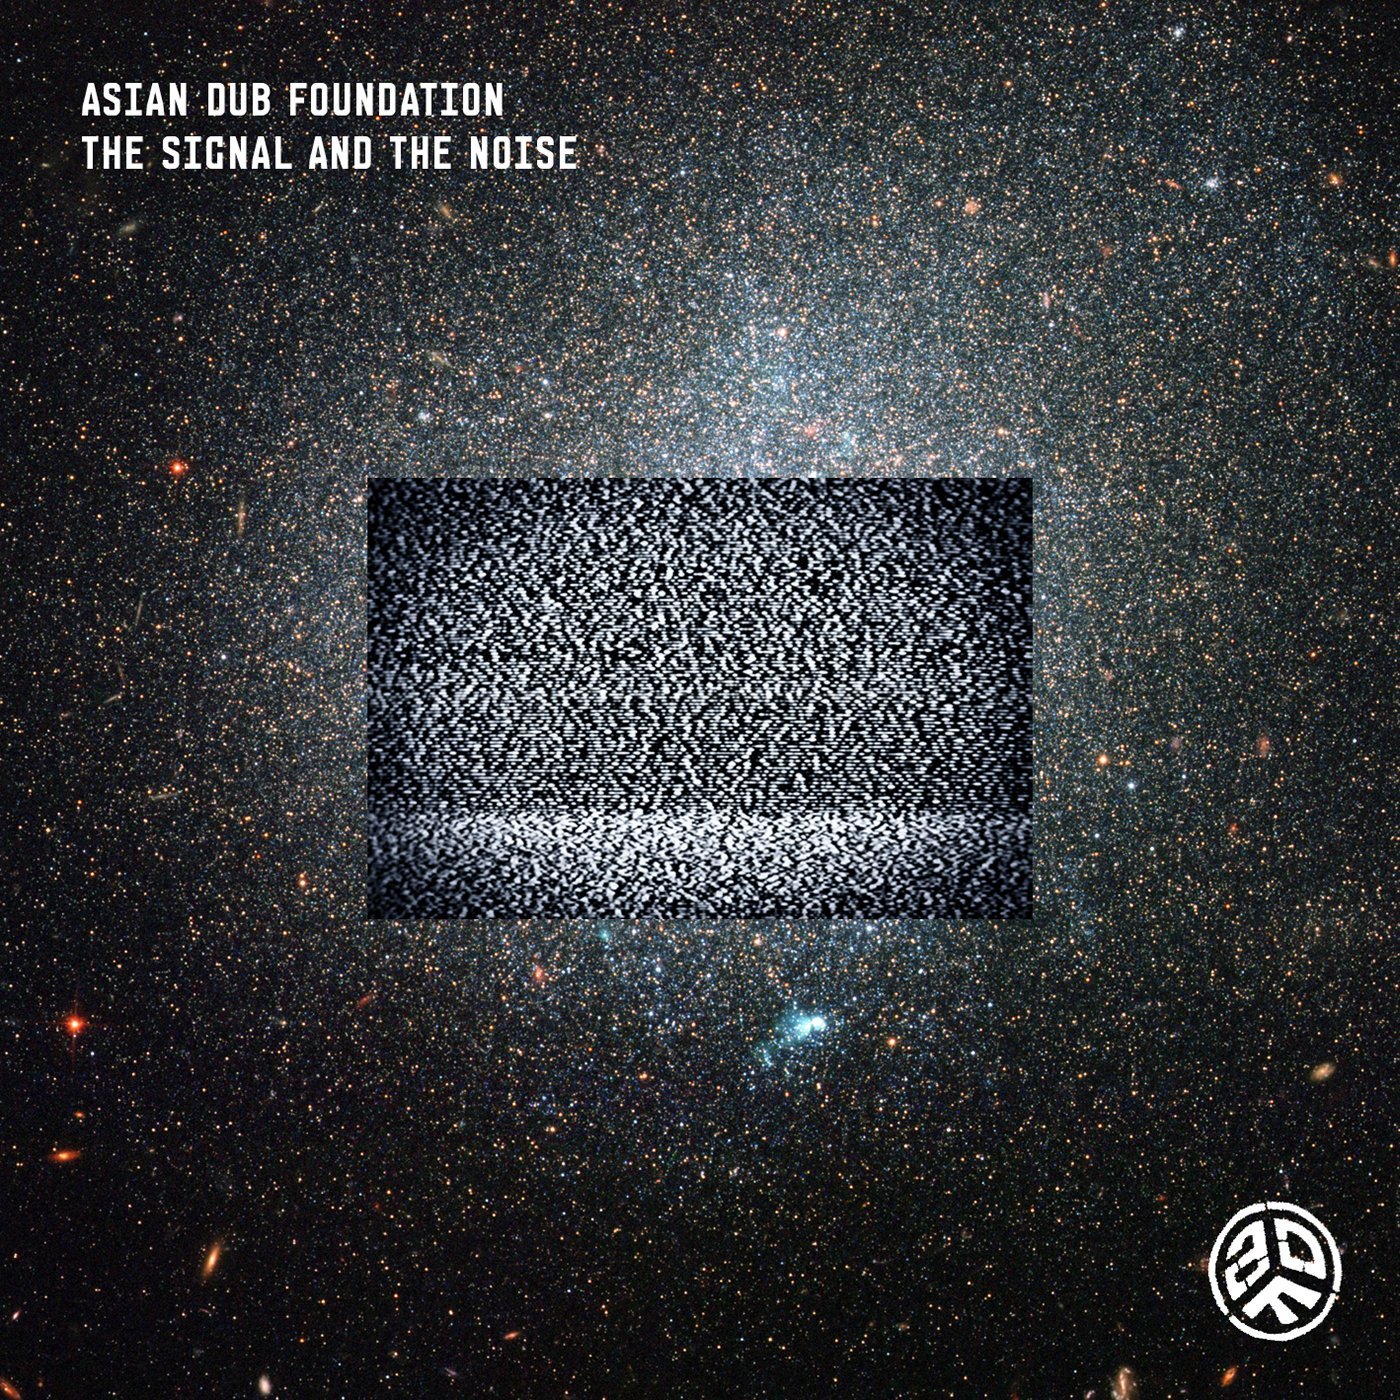 Asian Dub Foundation Free Listening on SoundCloud